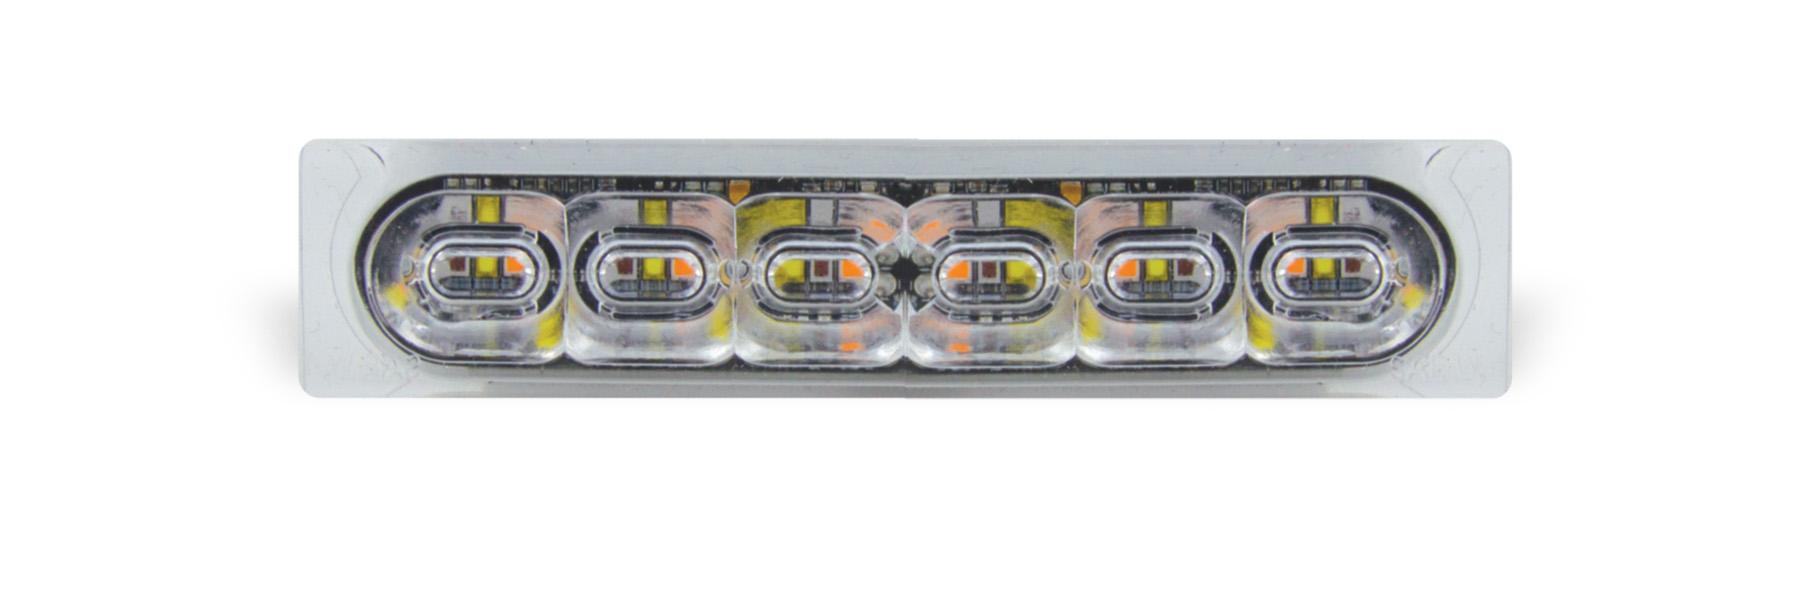 mpower® HD Light Product Image